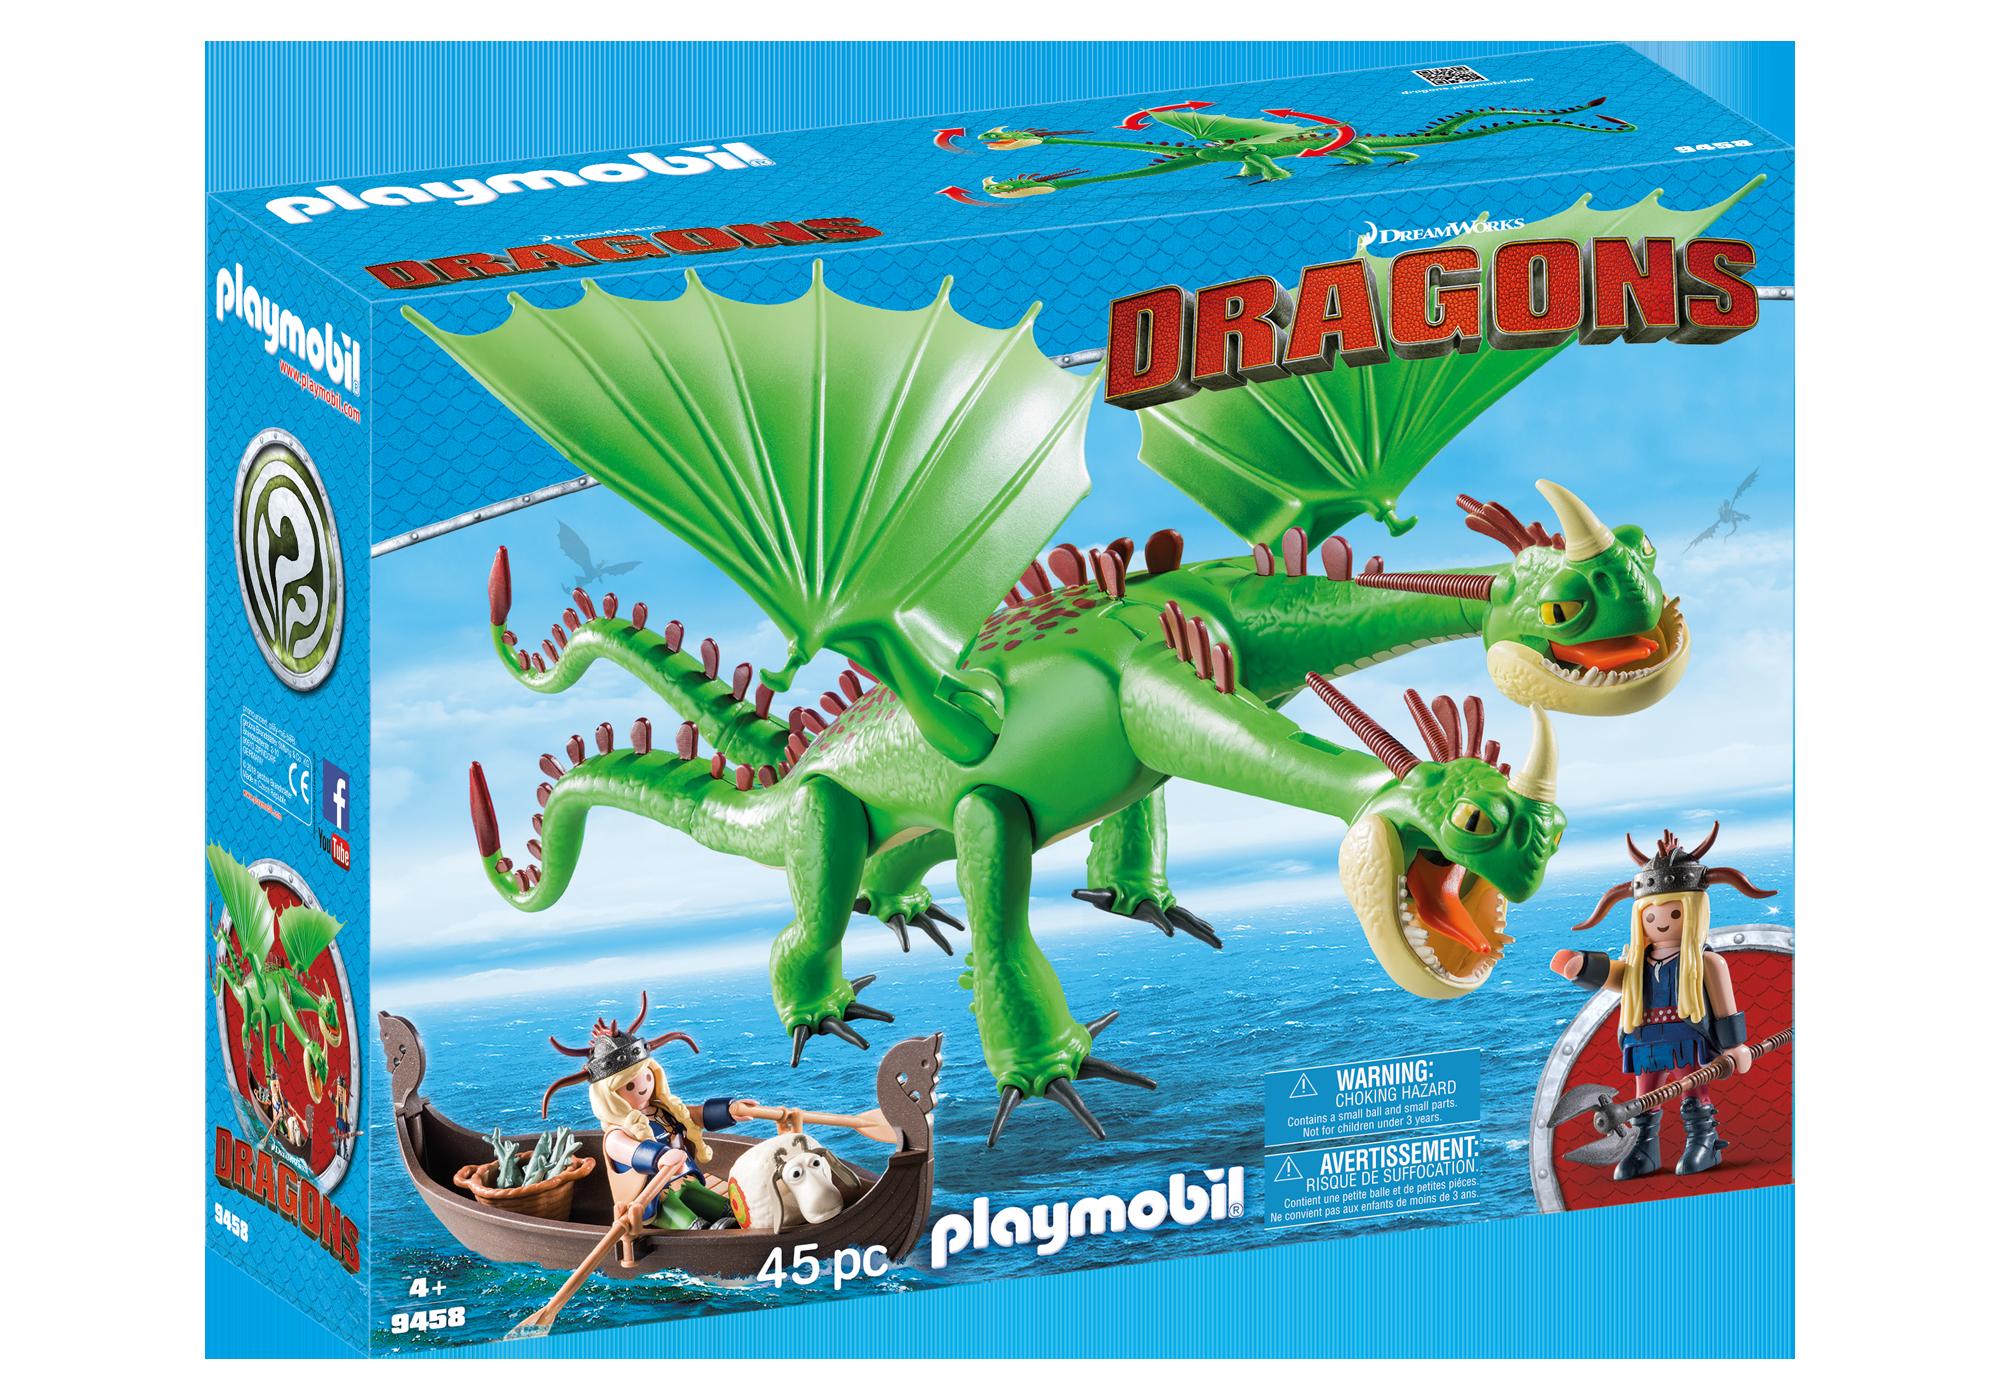 http://media.playmobil.com/i/playmobil/9458_product_box_front/Dragón 2 Cabezas con Chusco y Brusca